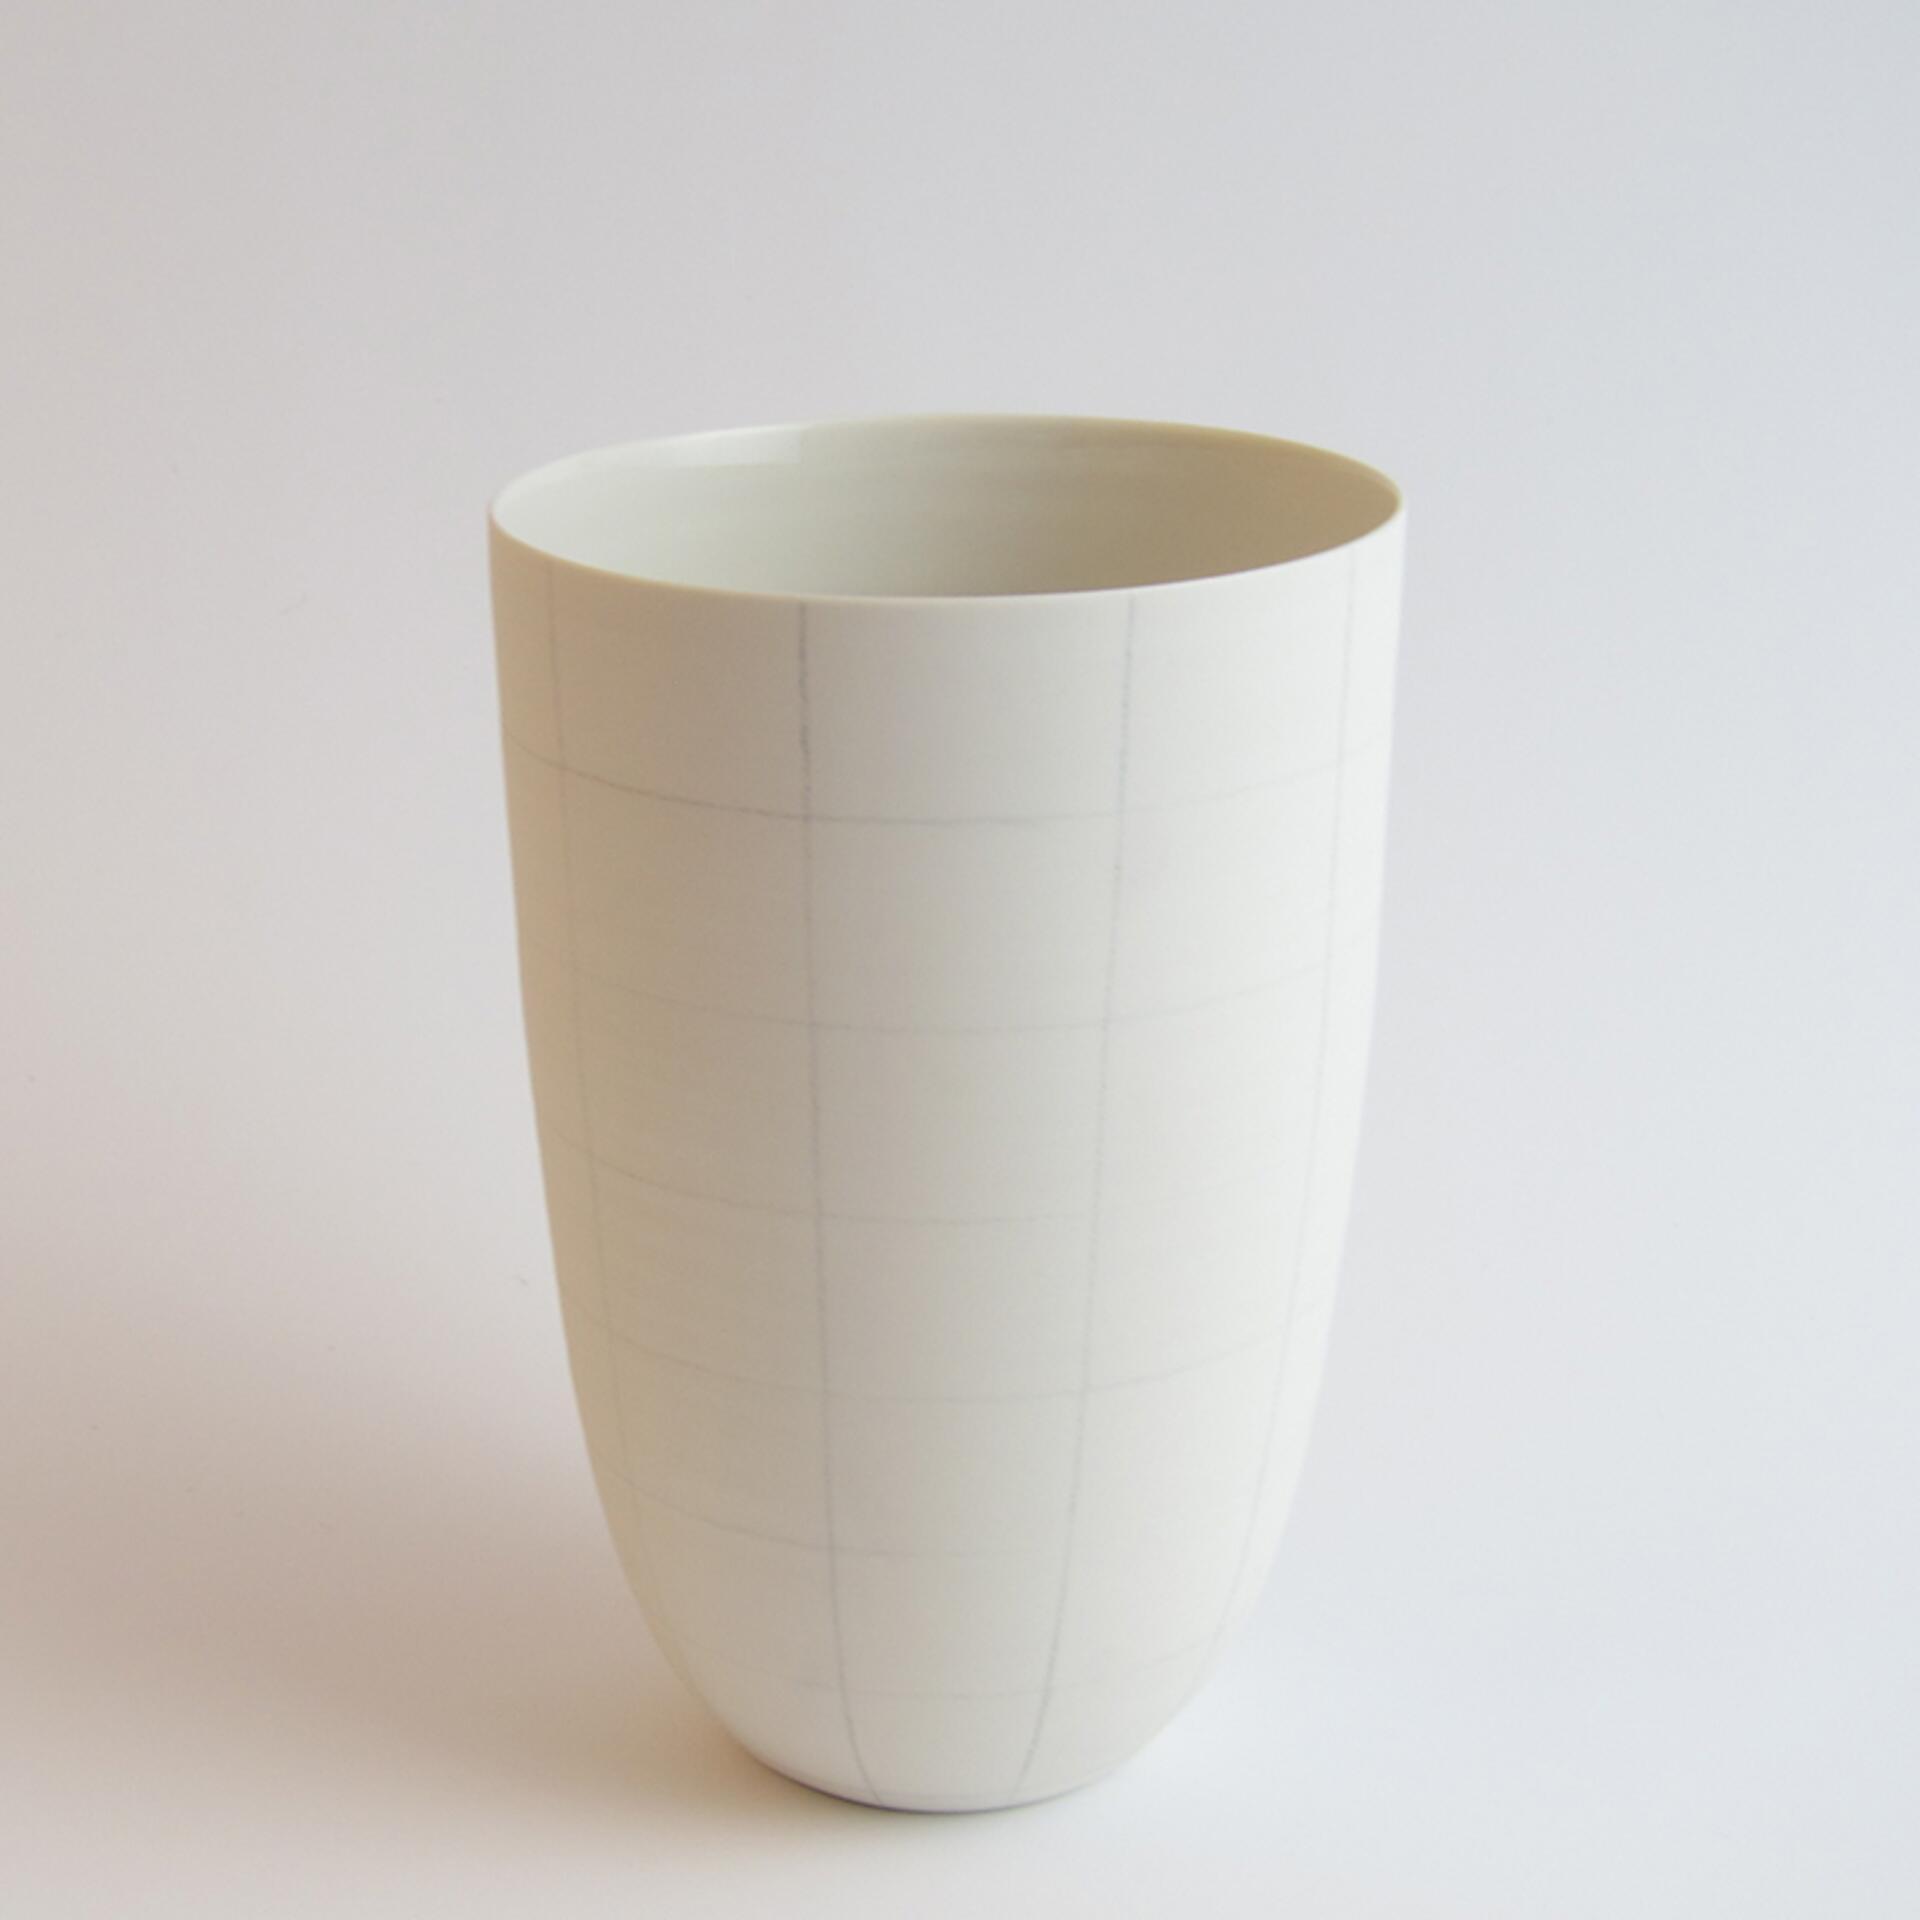 Schoemig Porzellan Vase Graph Quadrat